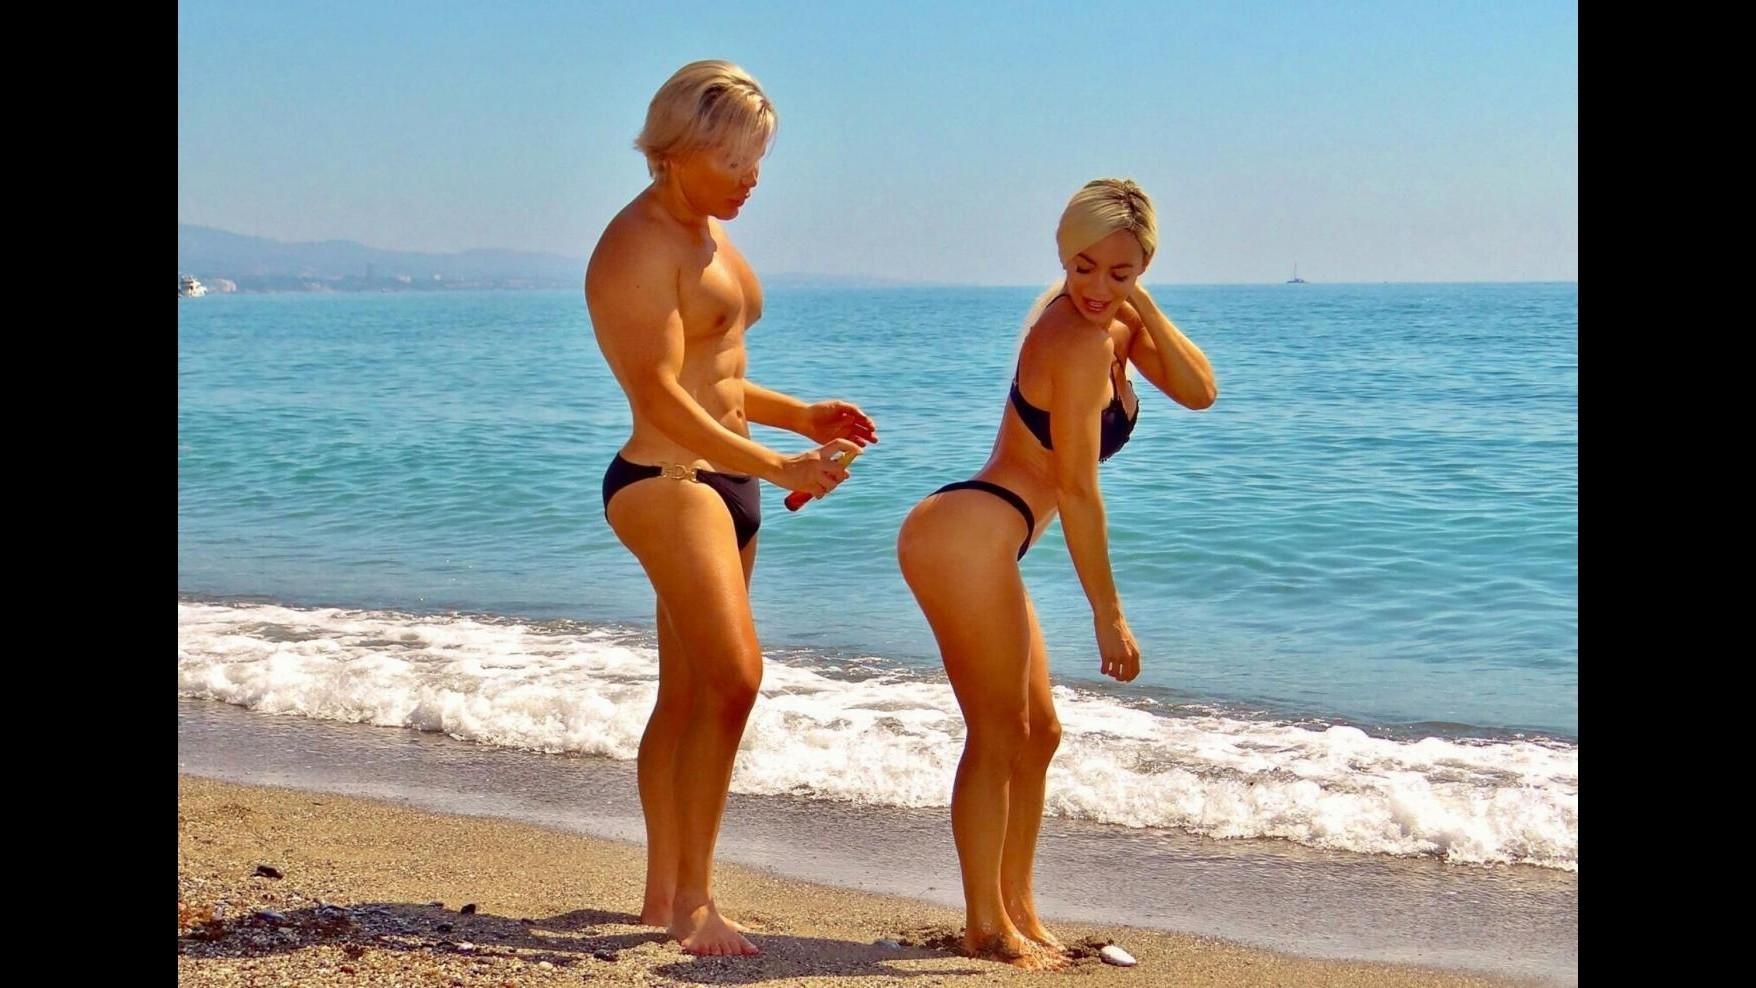 FOTO Scatti di plastica per i cloni umani di Barbie e Ken a Marbella